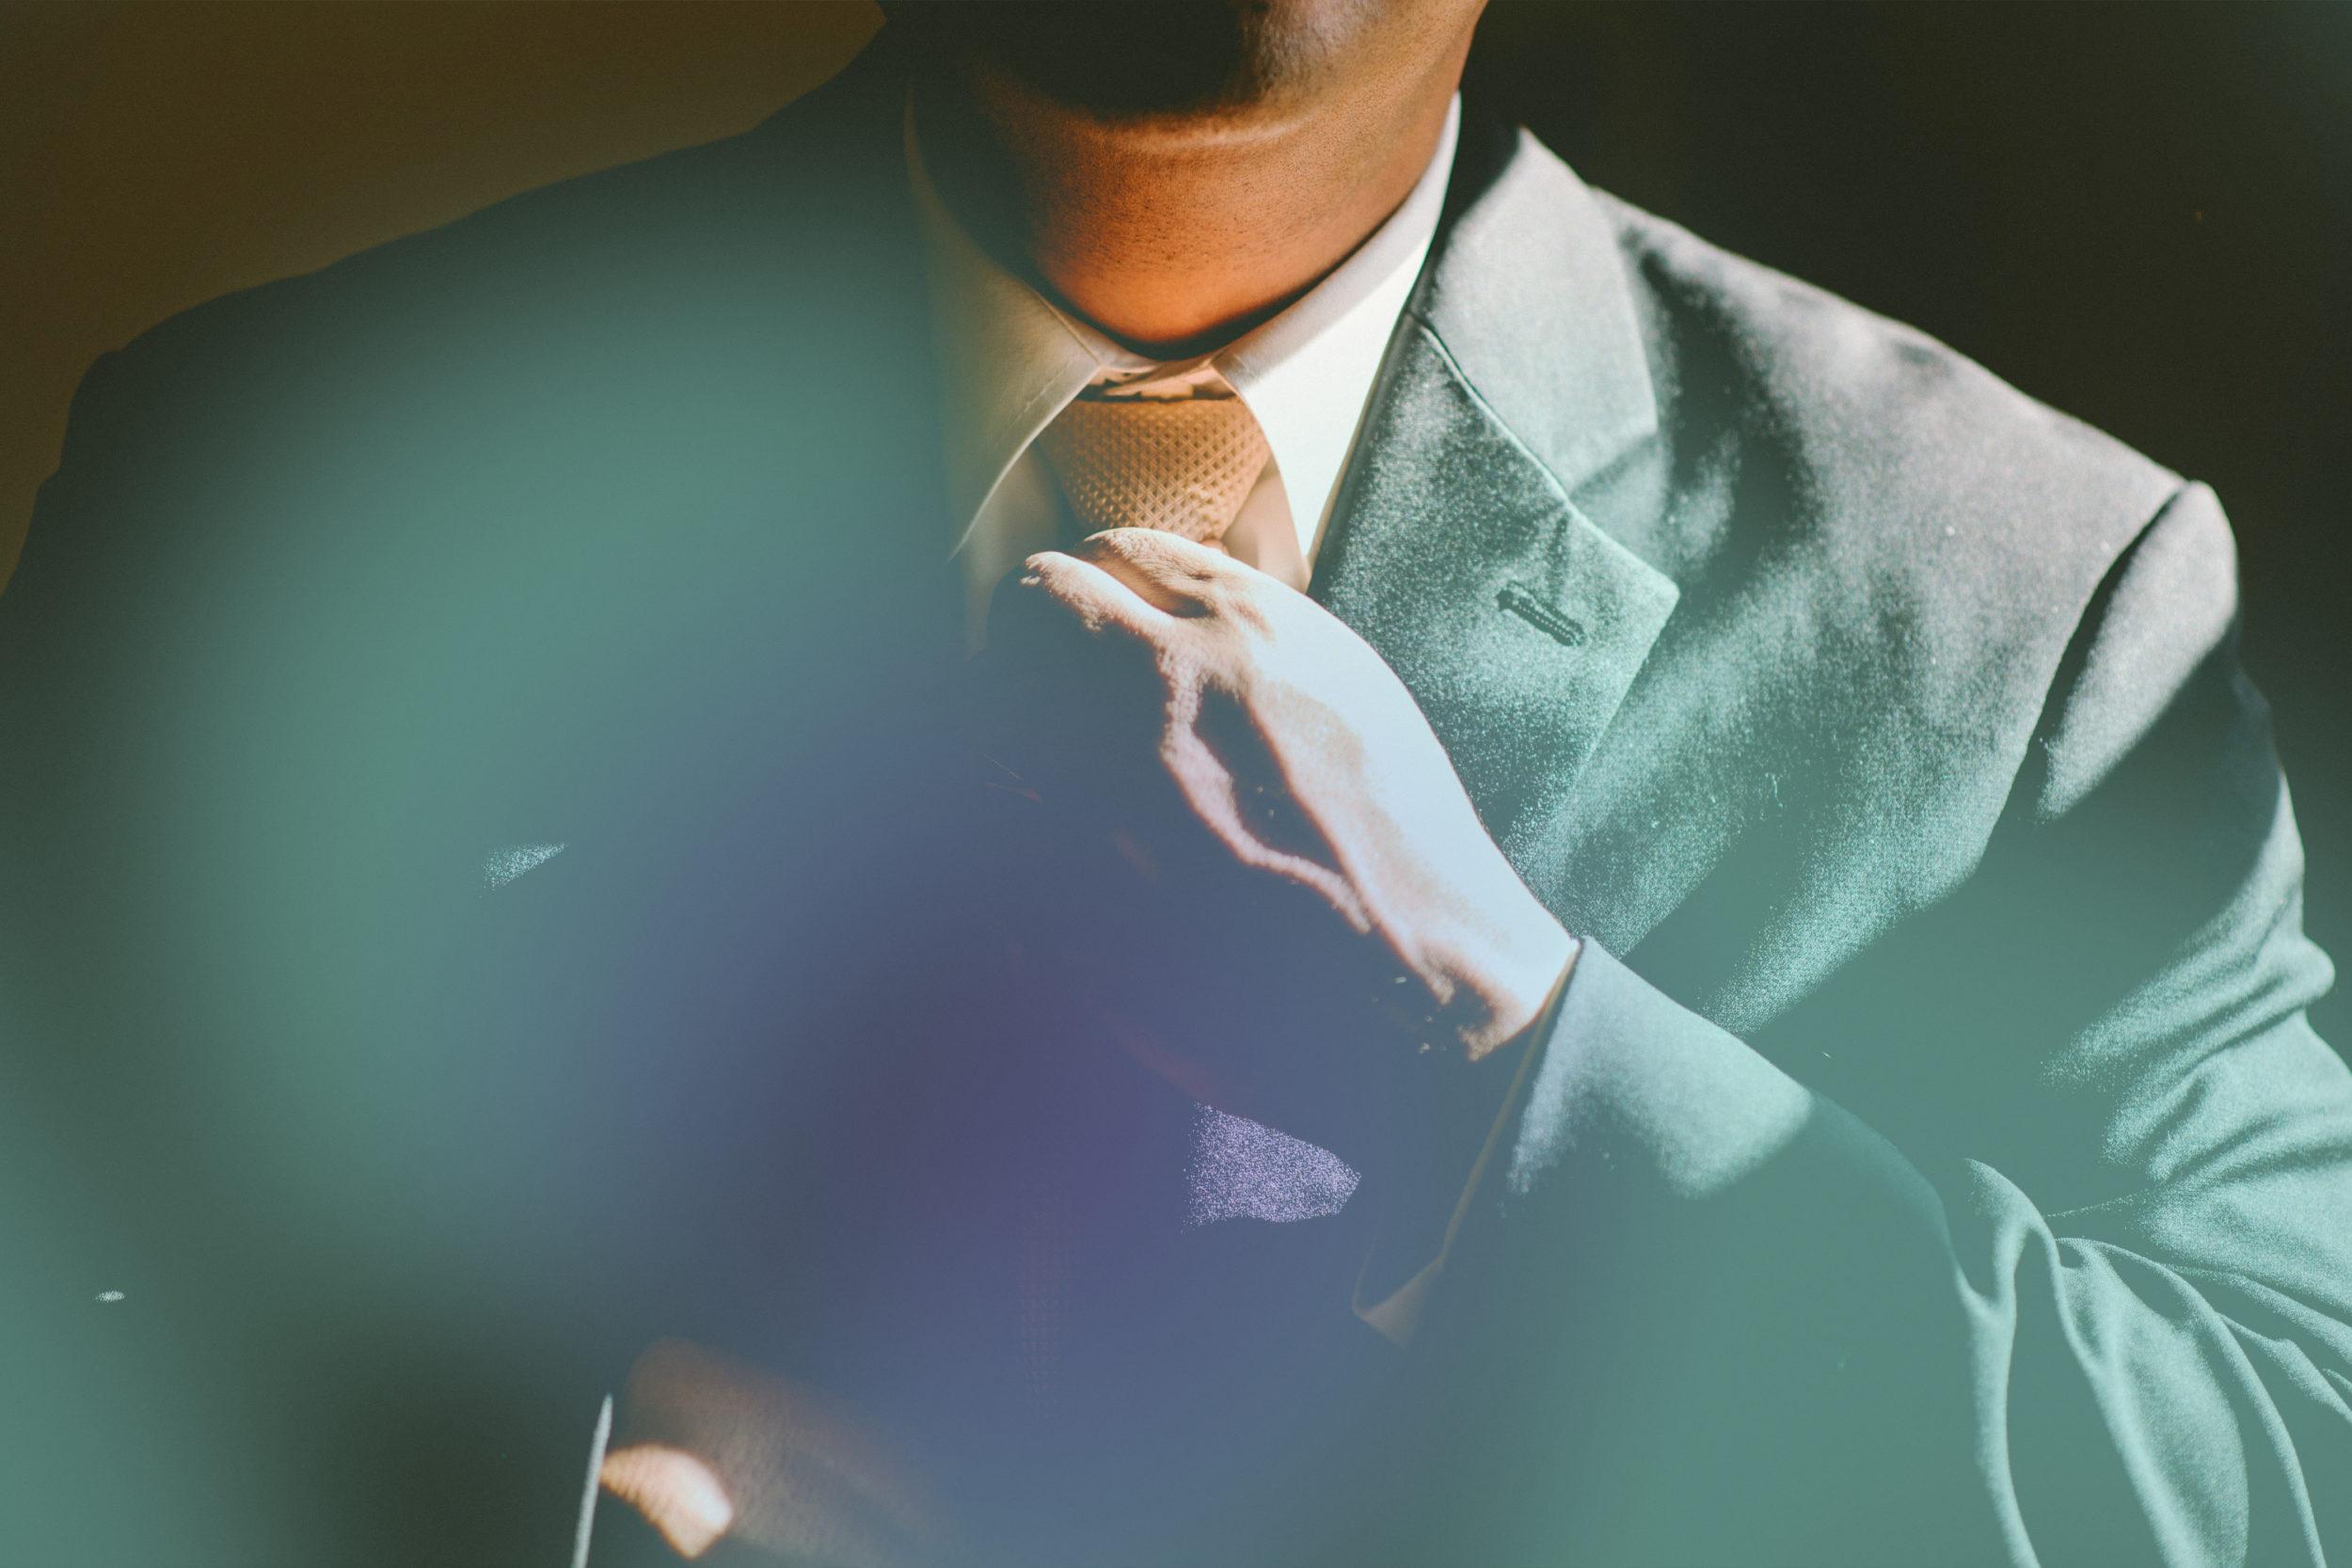 Praktikumserfahrung bei Infocient - mit dem SAP Berater zum Kunden